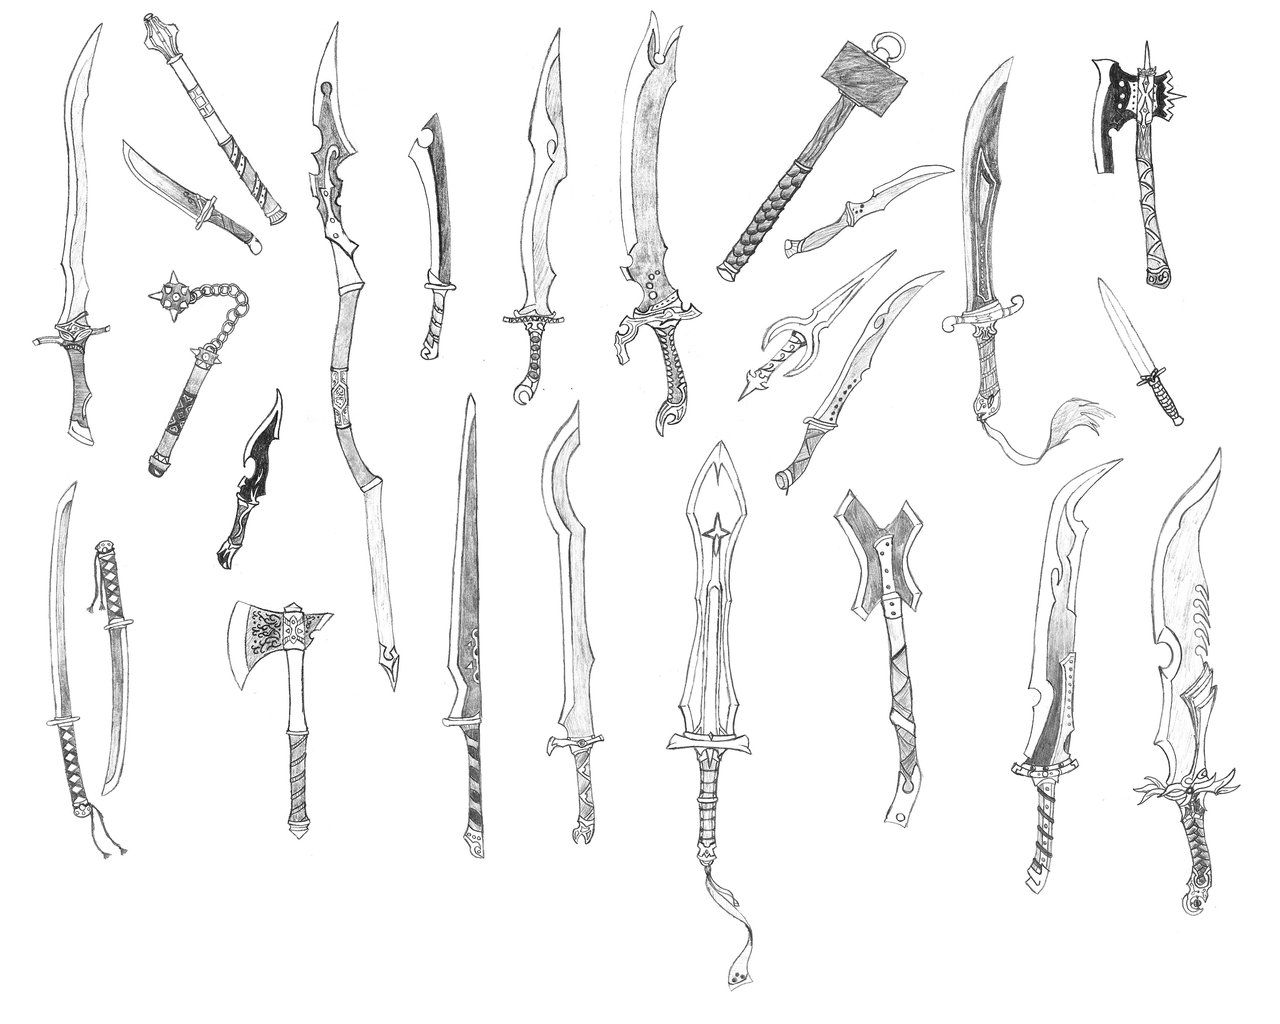 random weapons 3 by bladedog deviantart com on  deviantart